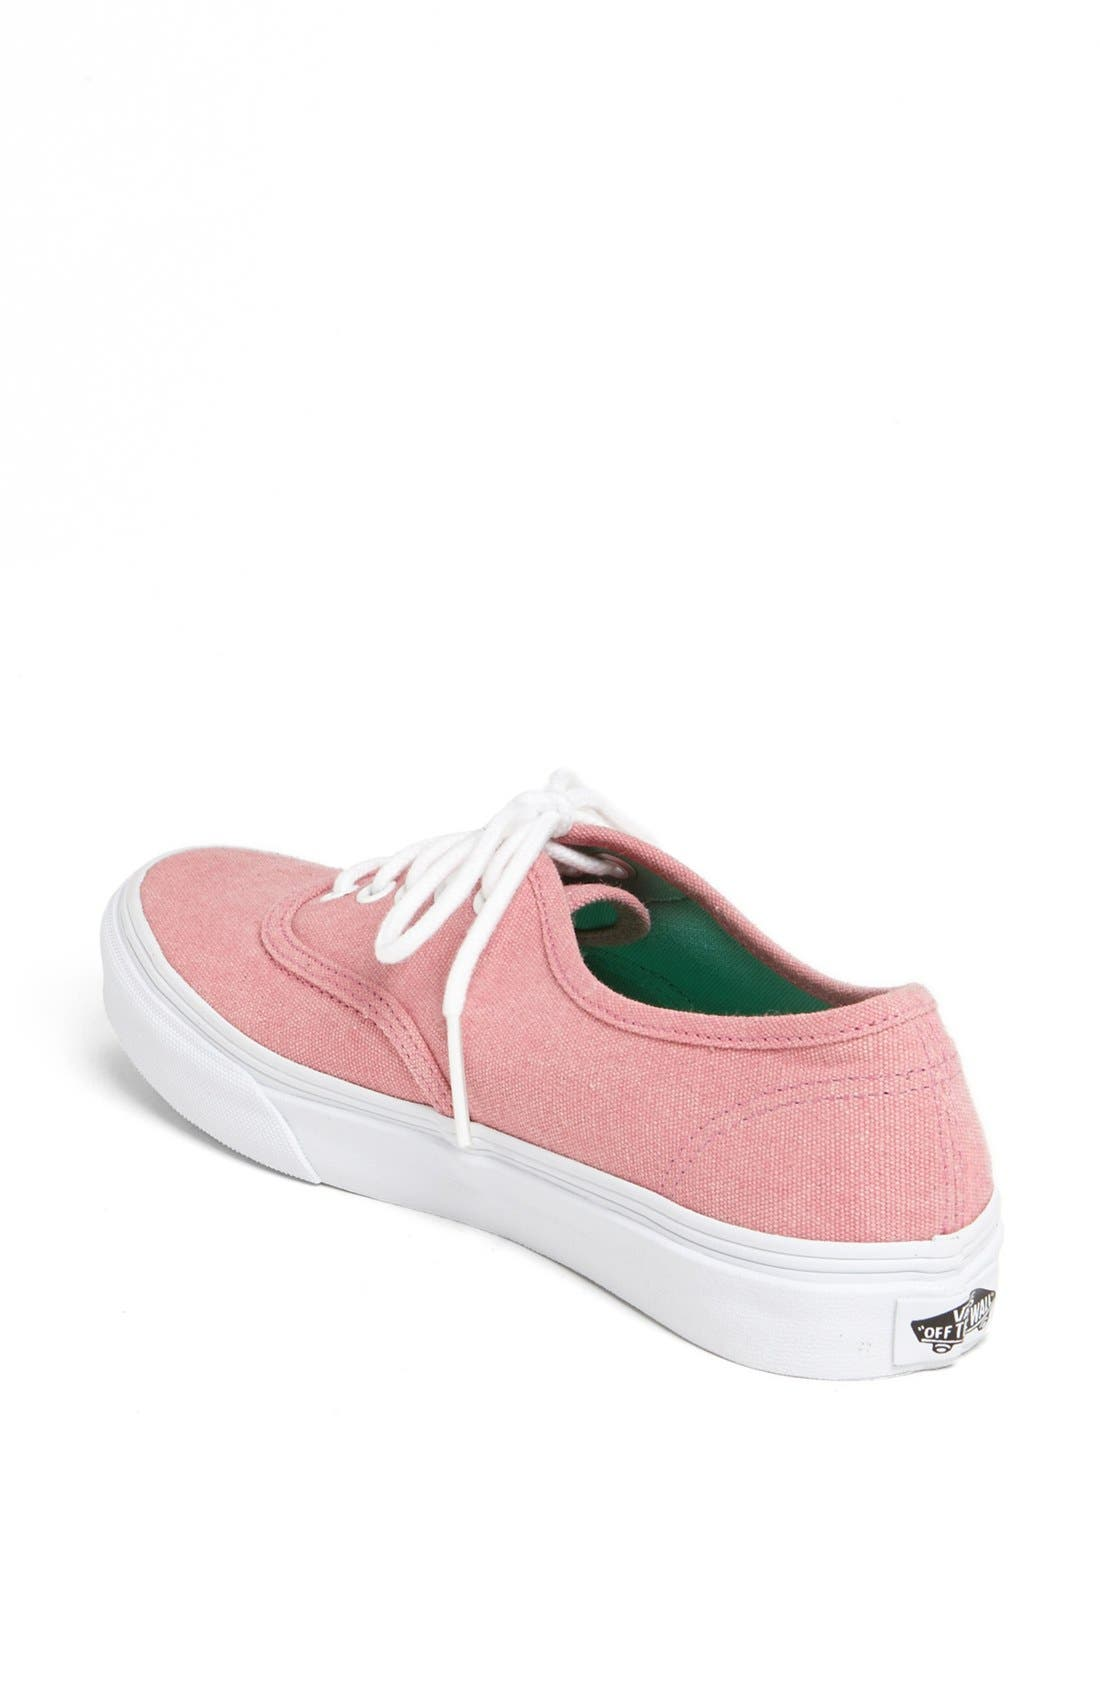 Alternate Image 2  - Vans 'Authentic - Slim' Sneaker (Women)